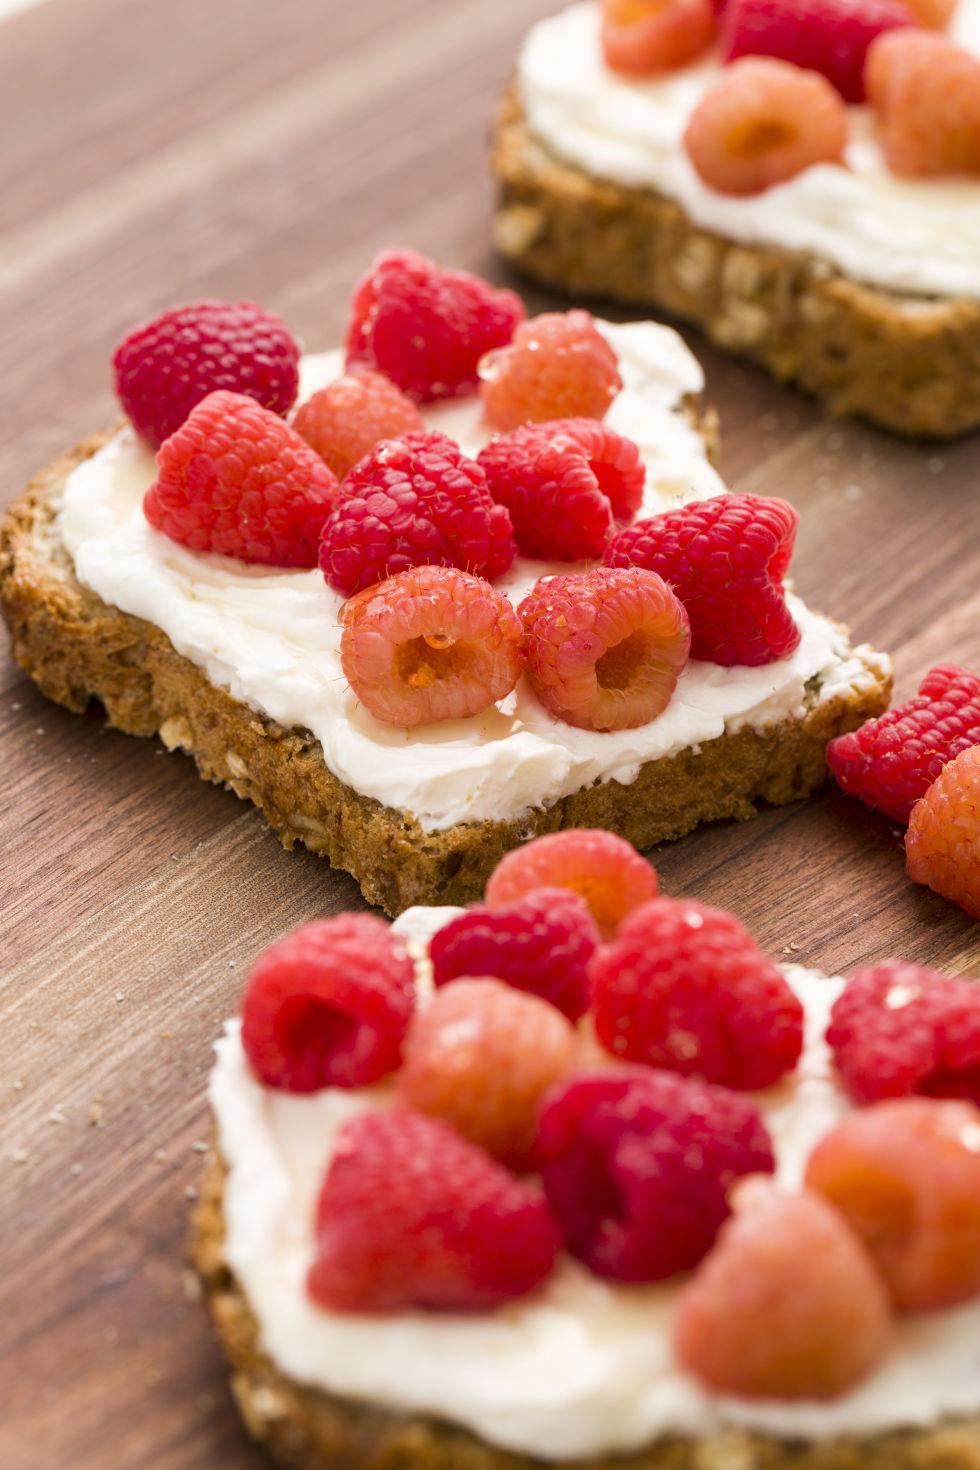 50 Best Healthy Snack Ideas